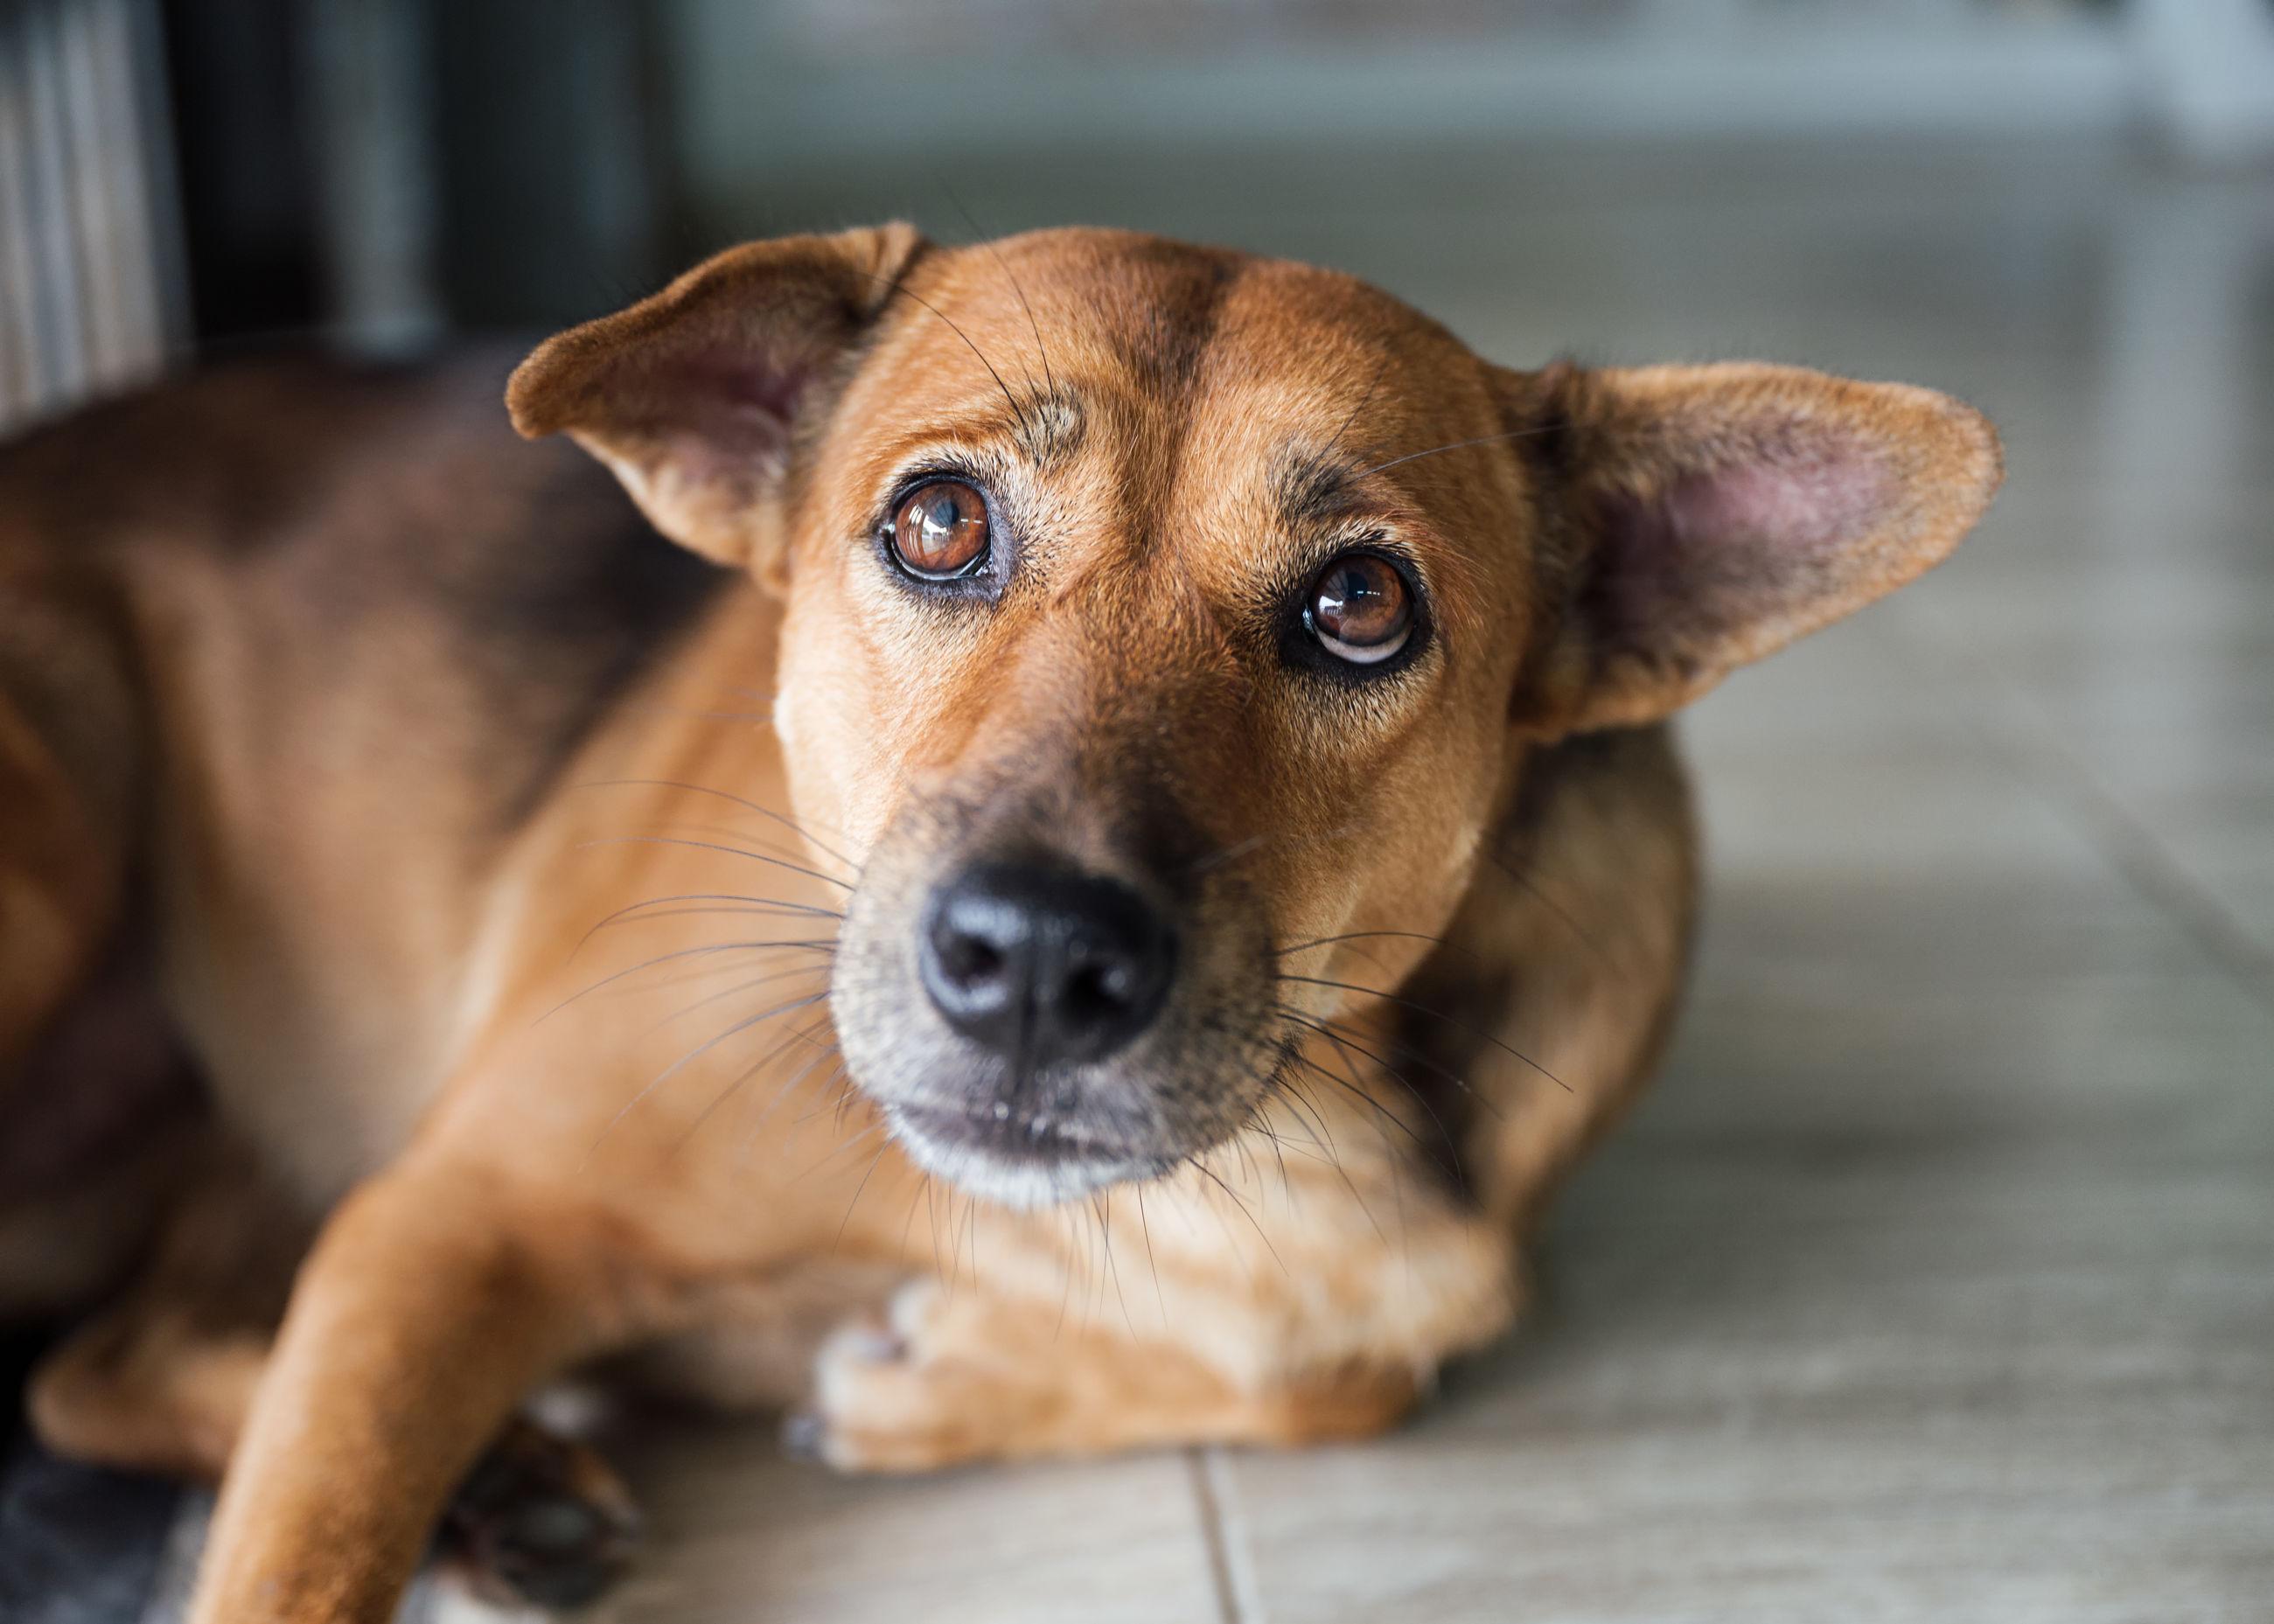 PORTRAIT OF DOG ON FLOOR